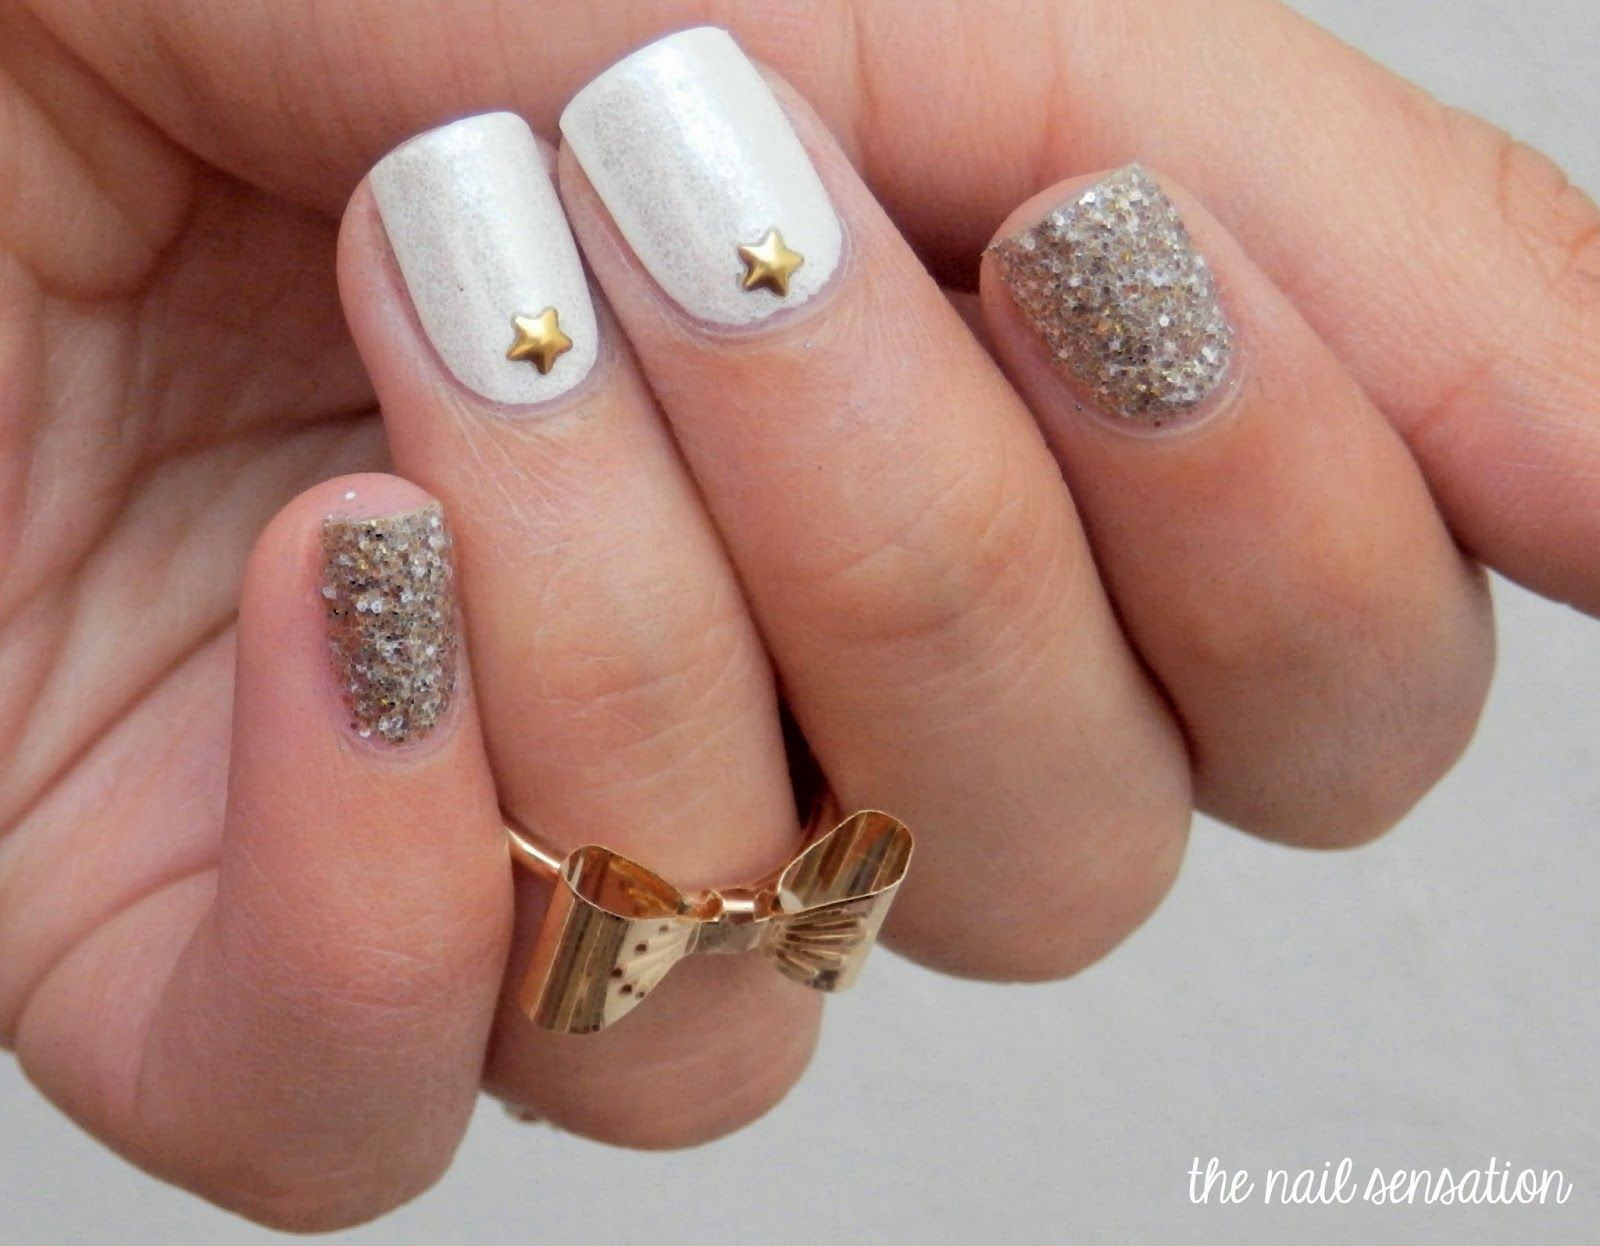 the nail sensation